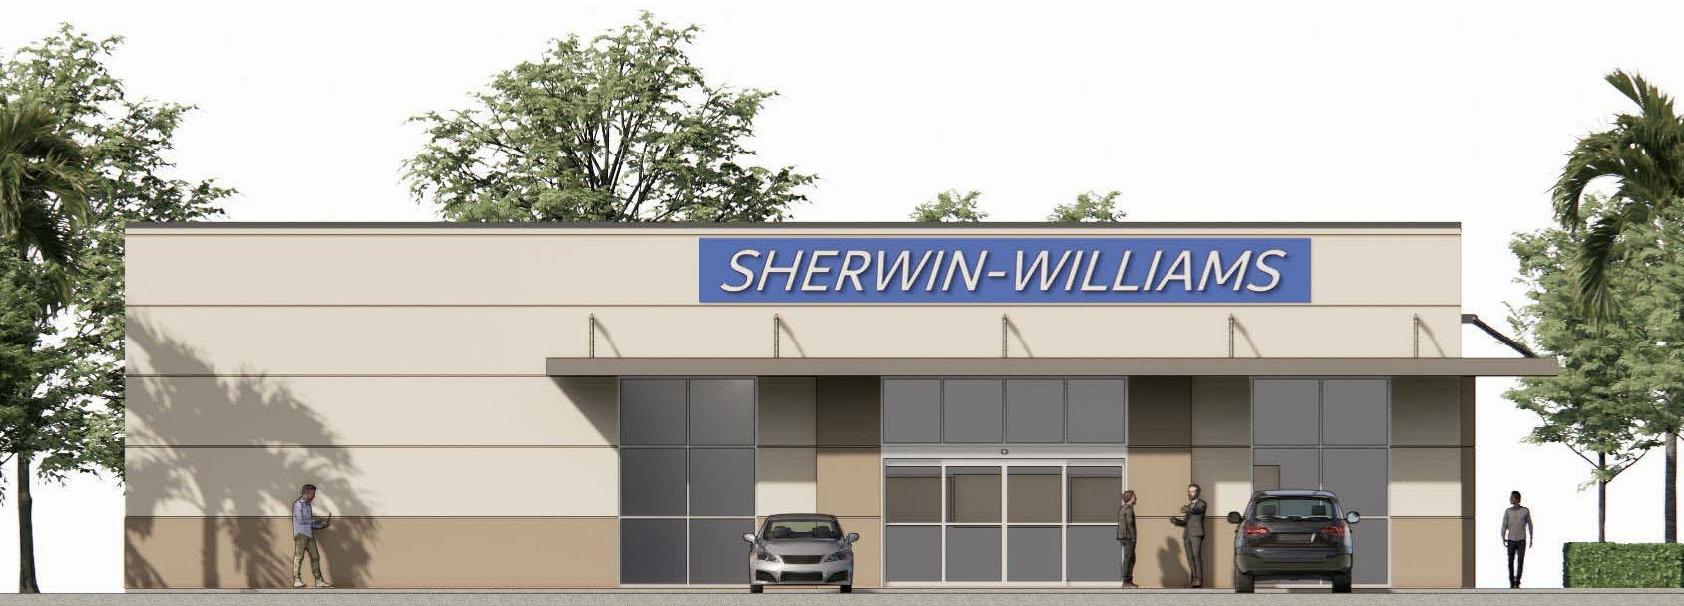 Sherwin Williams Rendering 3